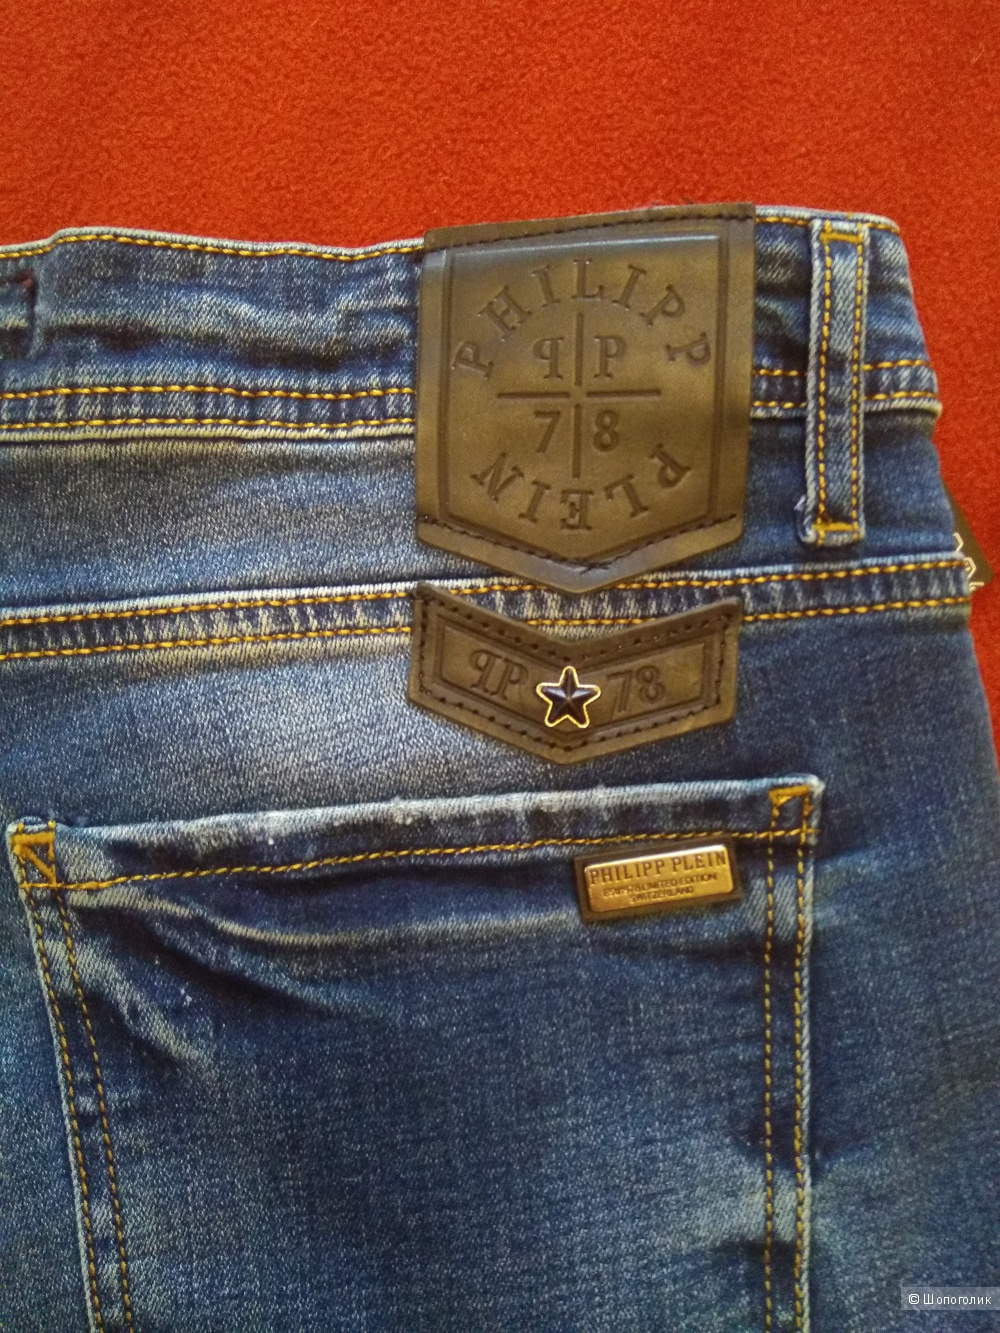 Мужские джинсы Philipp Plein 36 размер